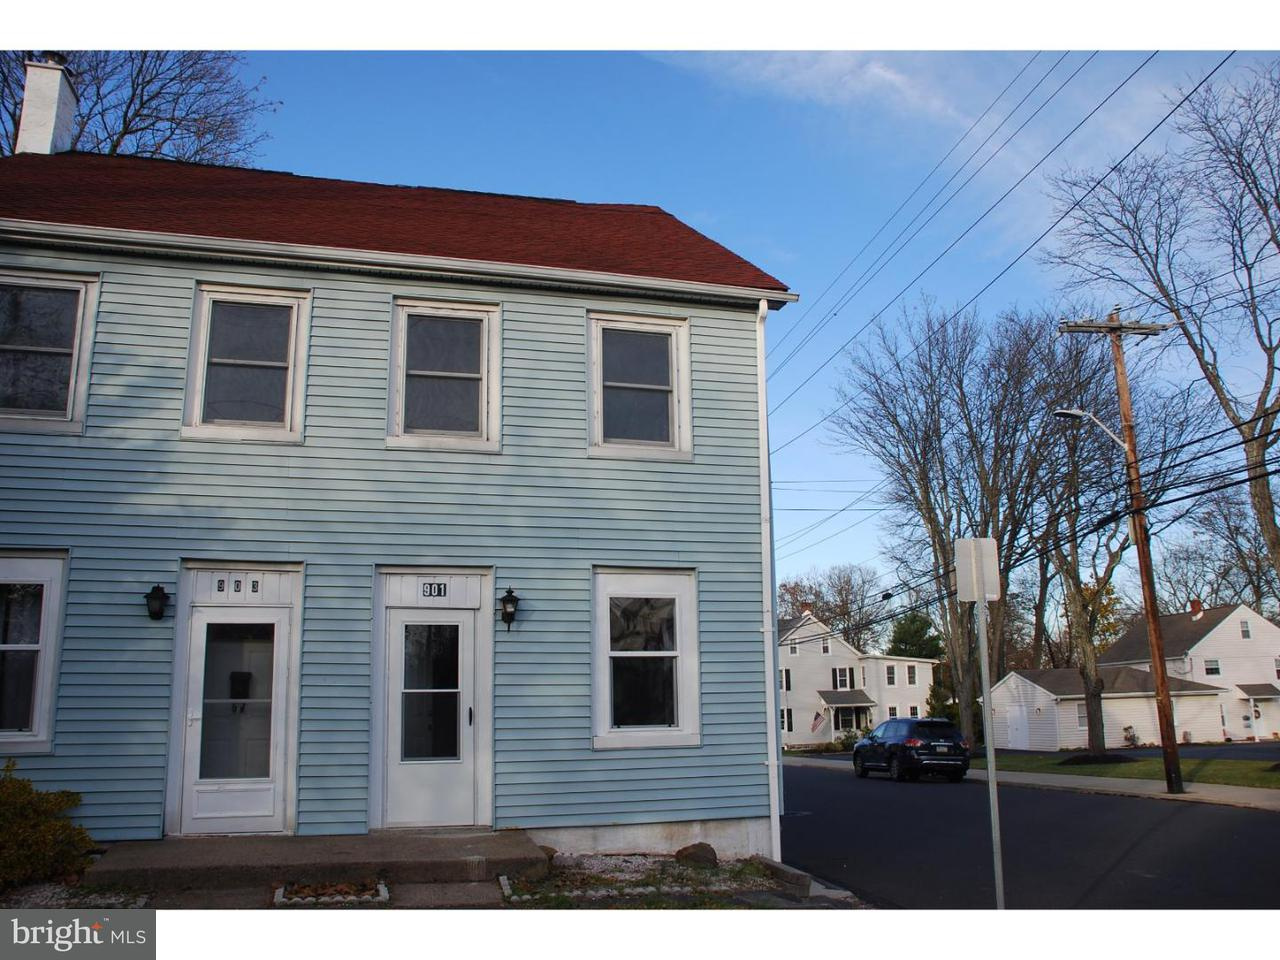 Casa unifamiliar adosada (Townhouse) por un Alquiler en 901 W BROAD Street Quakertown, Pennsylvania 18951 Estados Unidos